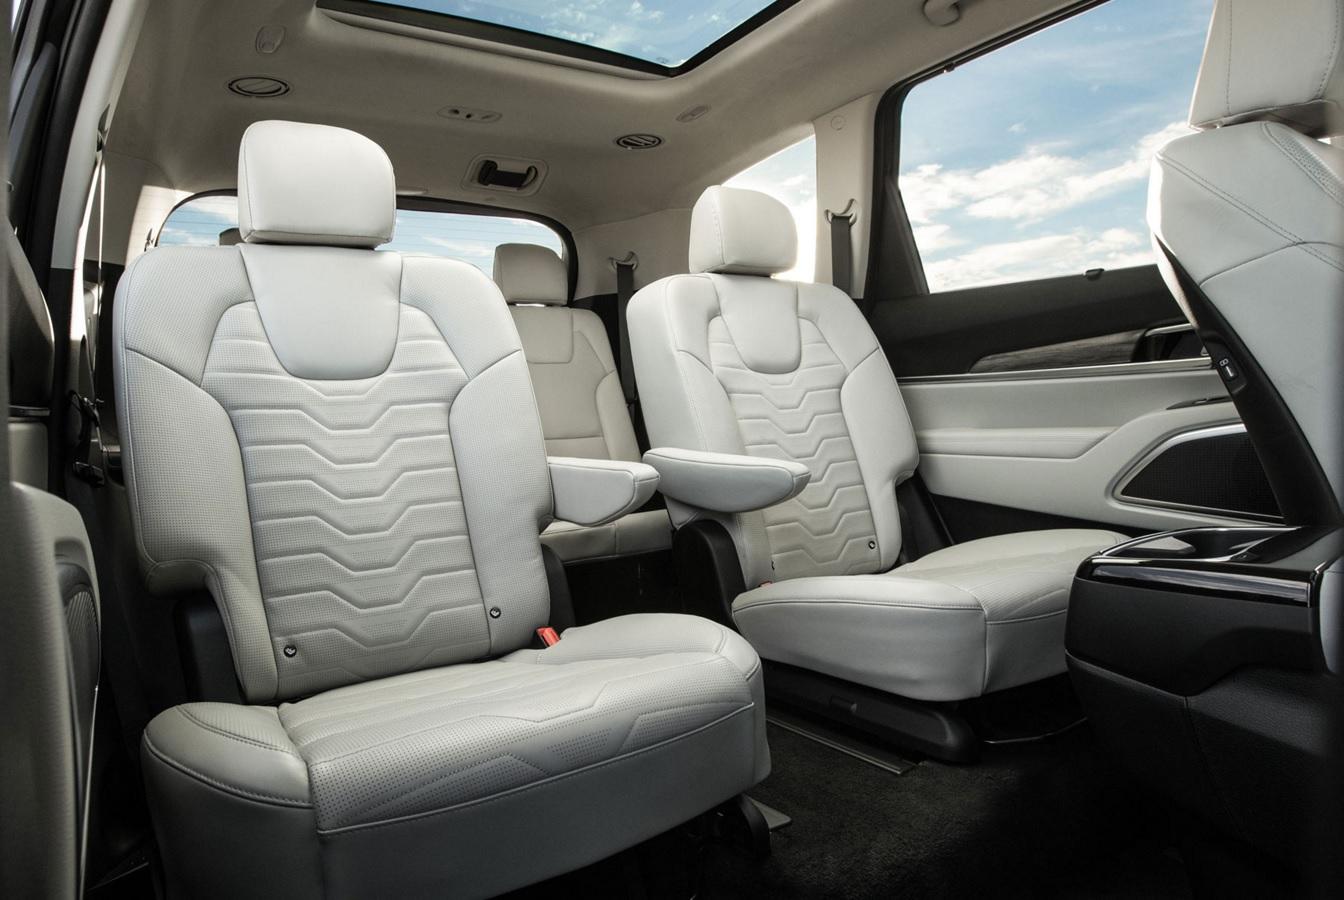 2020 Telluride Rear Seating